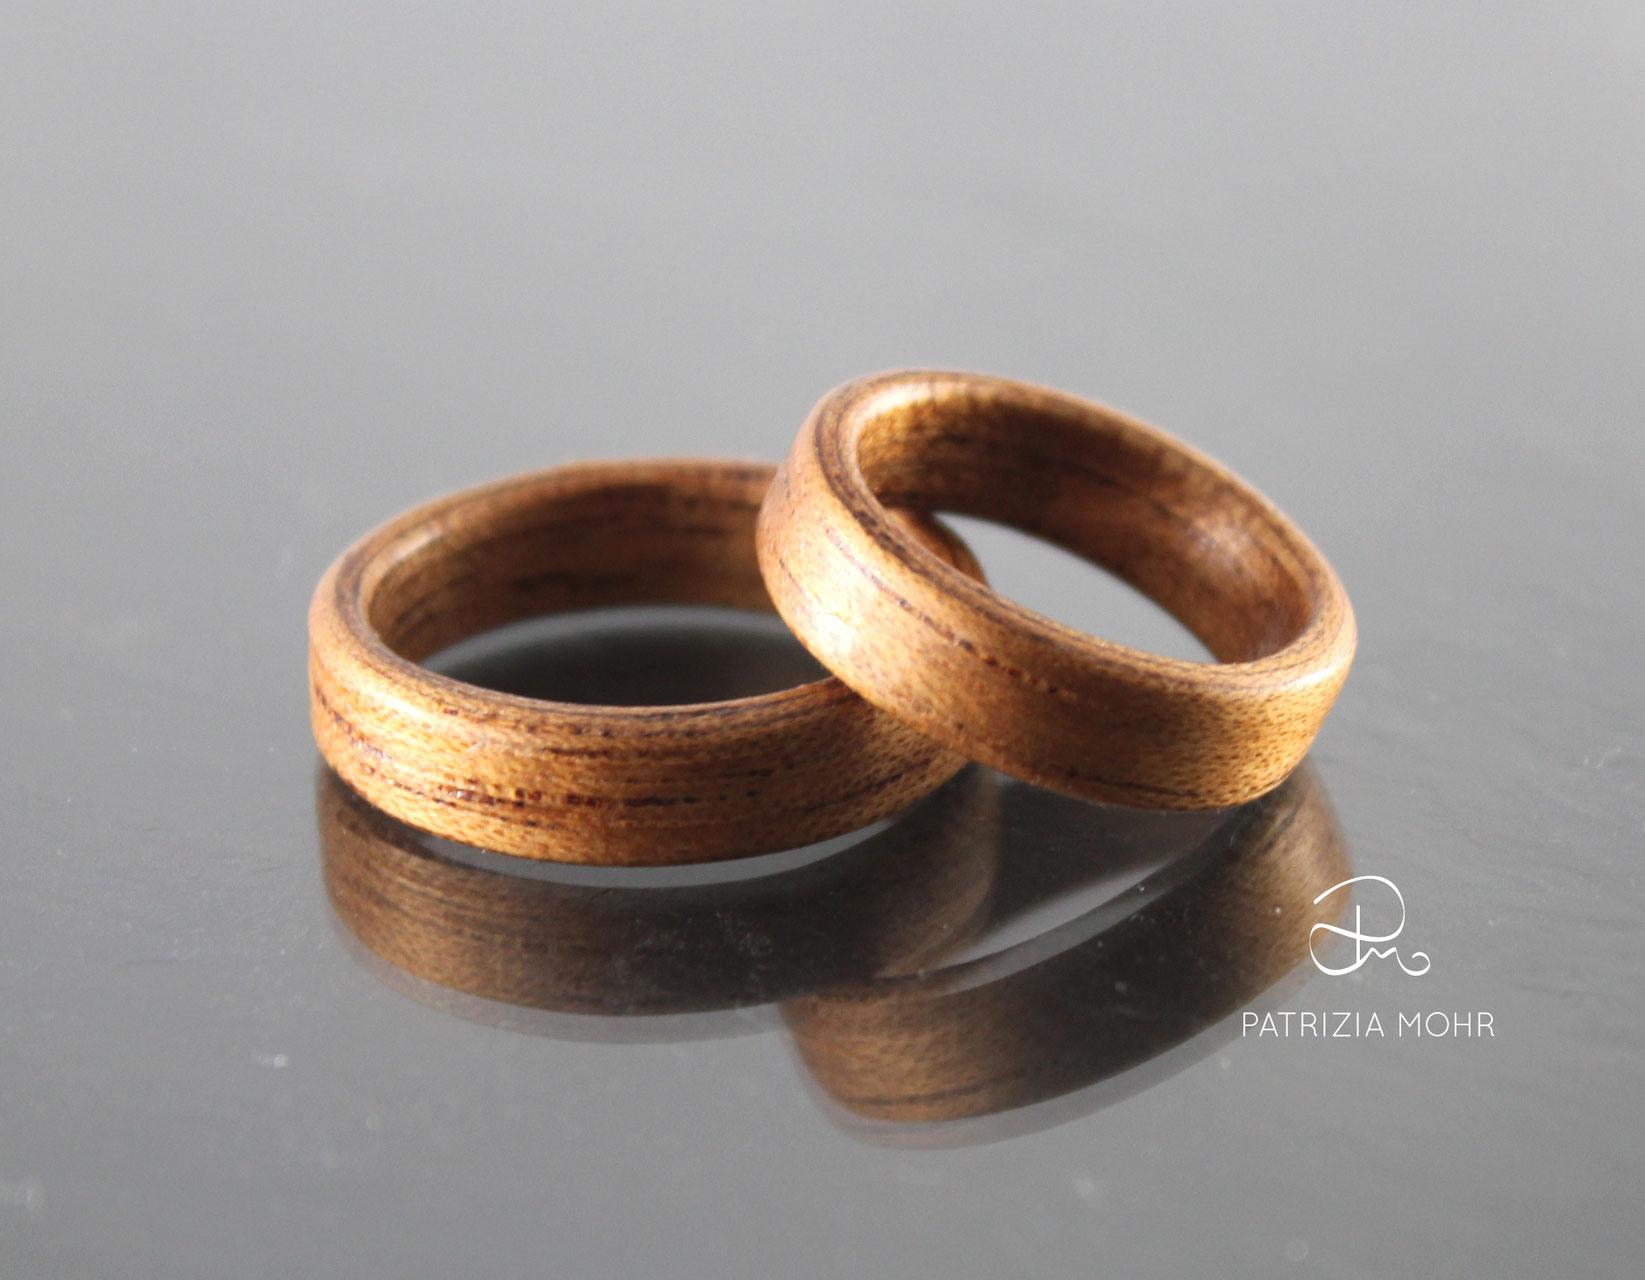 Holzringe - Partnerringe Aus Holz Günstig Online Kaufen